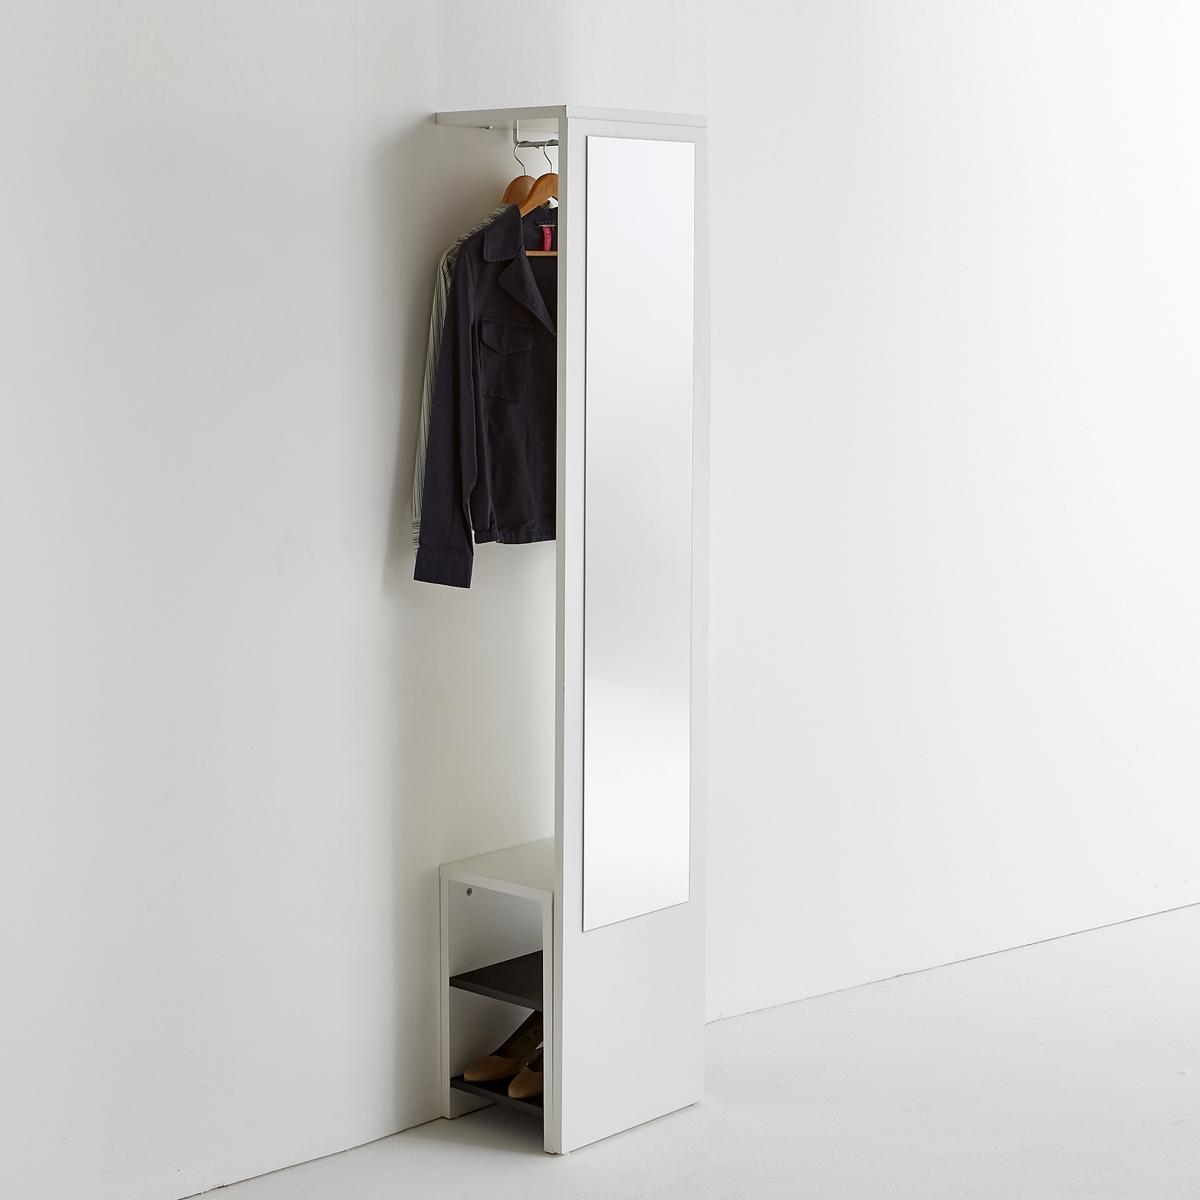 Appendiabiti a muro con specchio e panca, Reynal